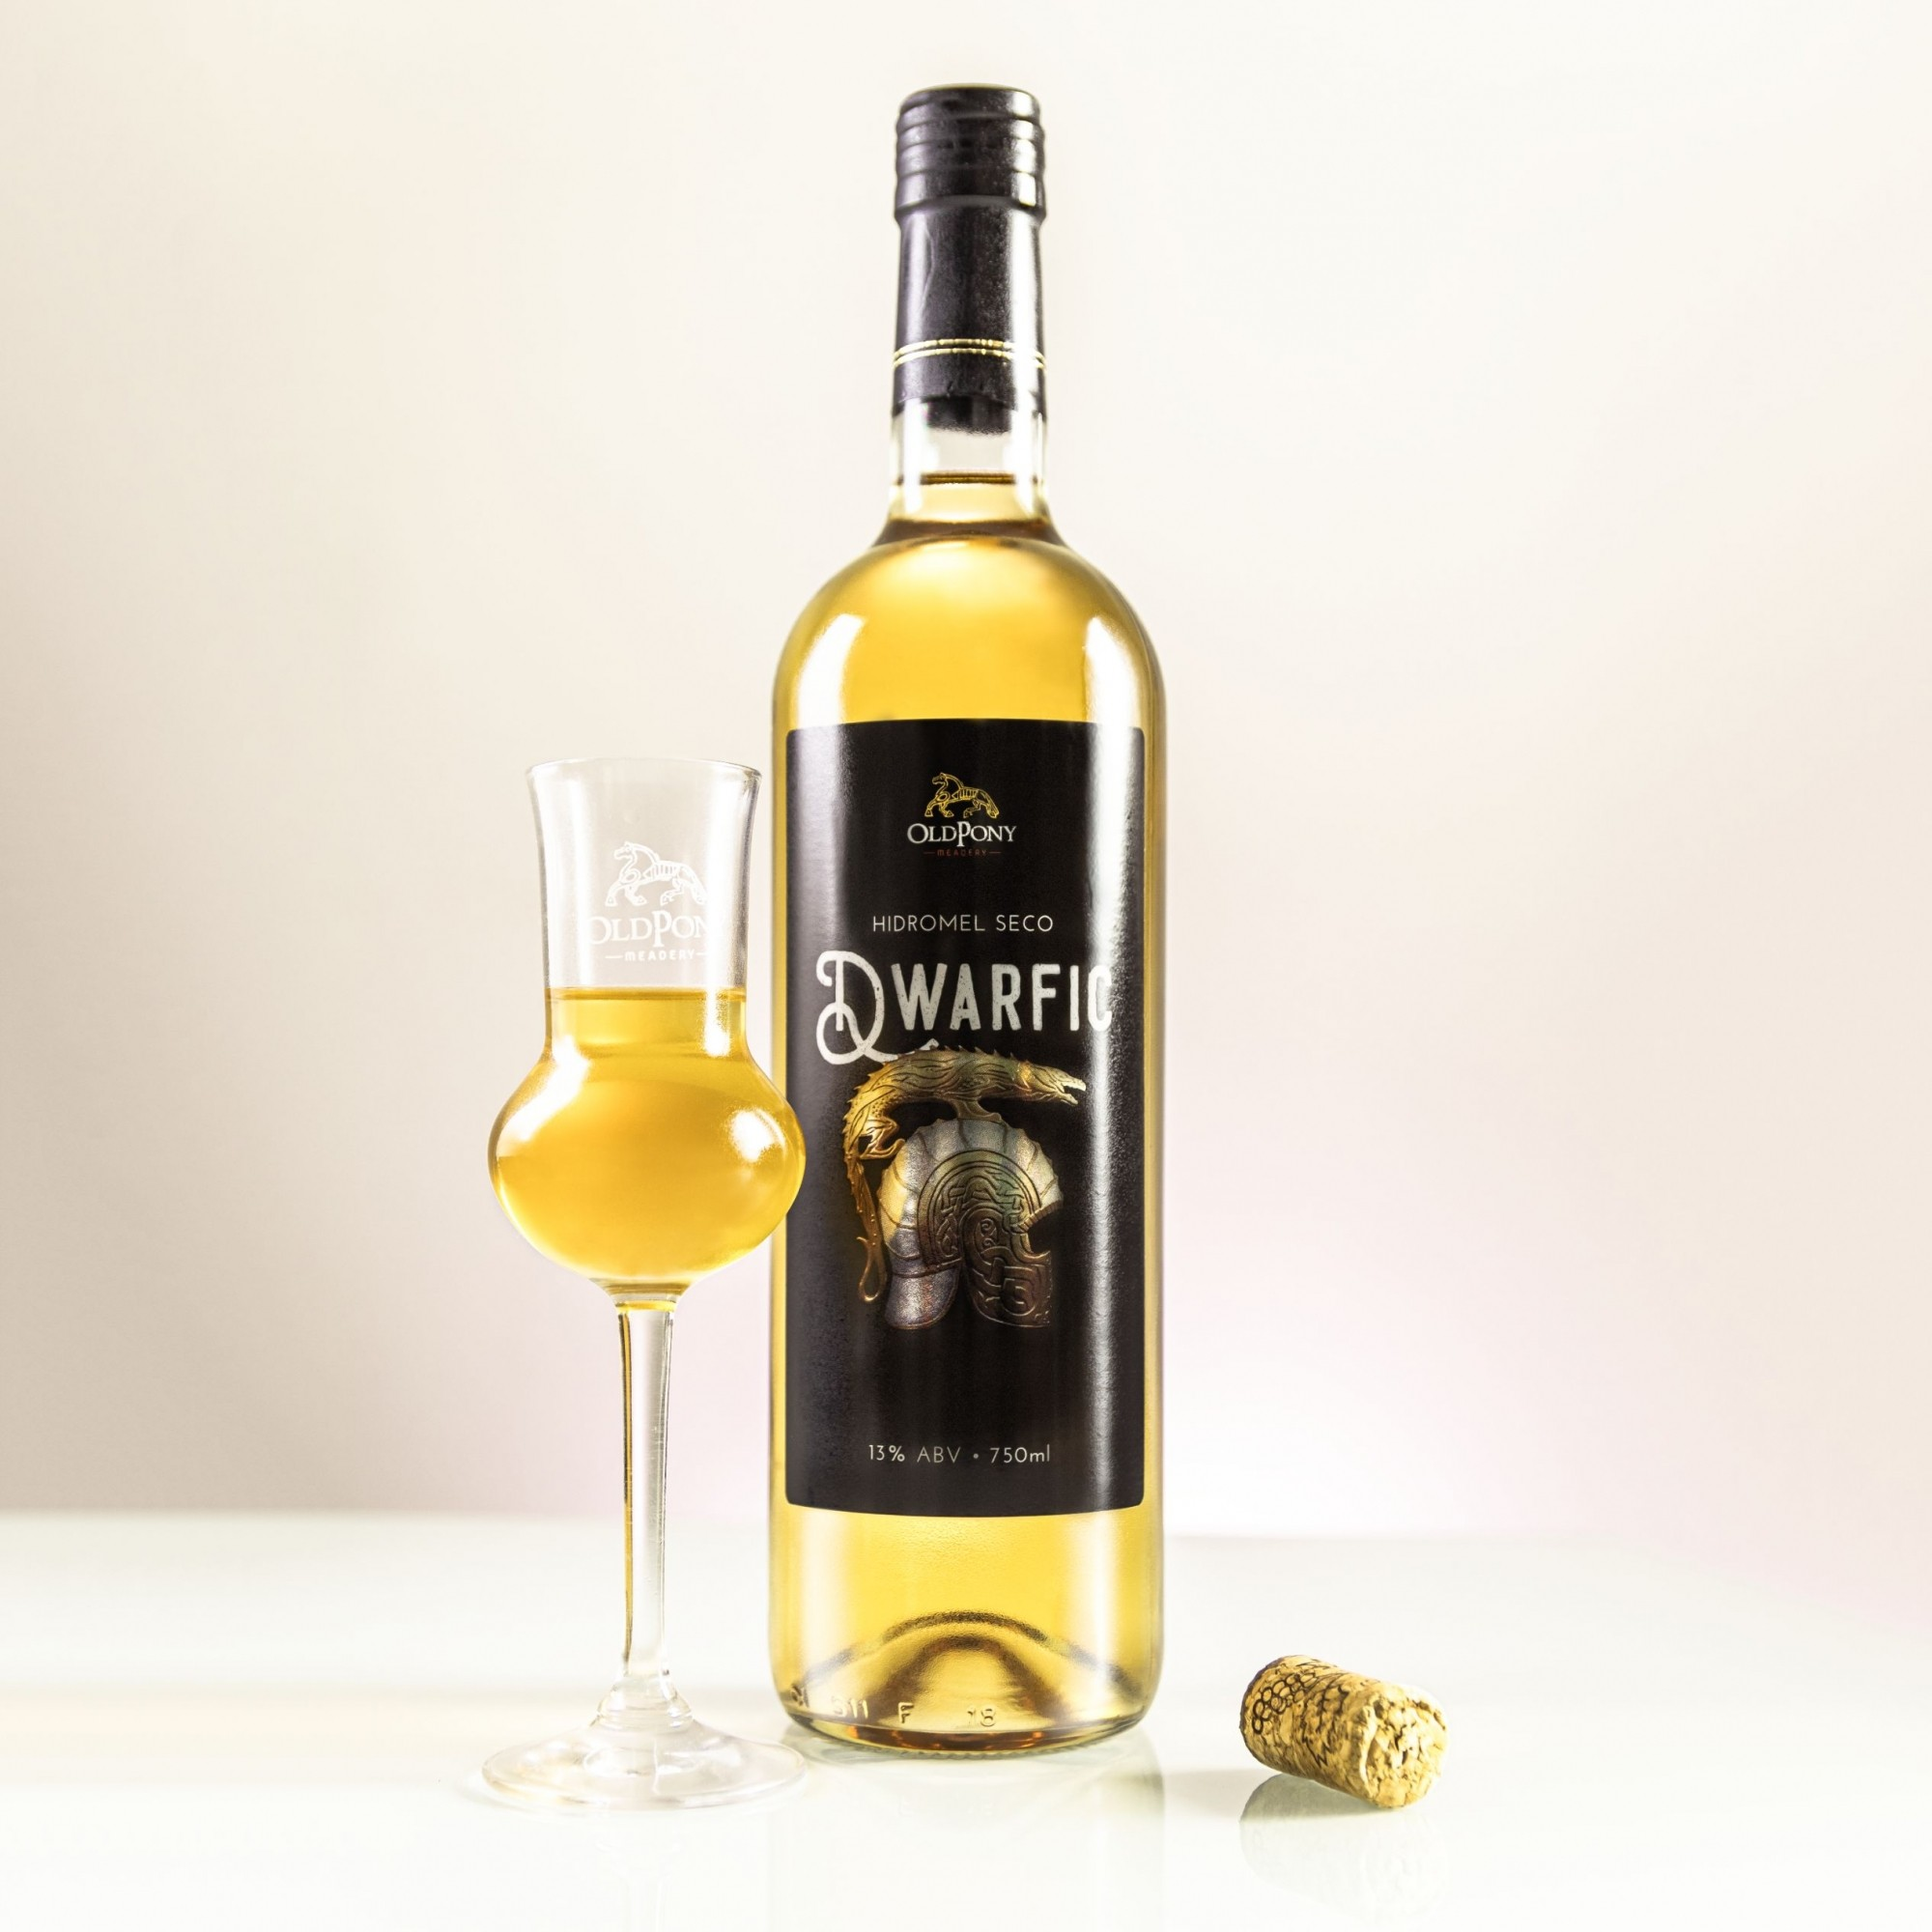 Dwarfic Hidromel seco de mel de laranjeira